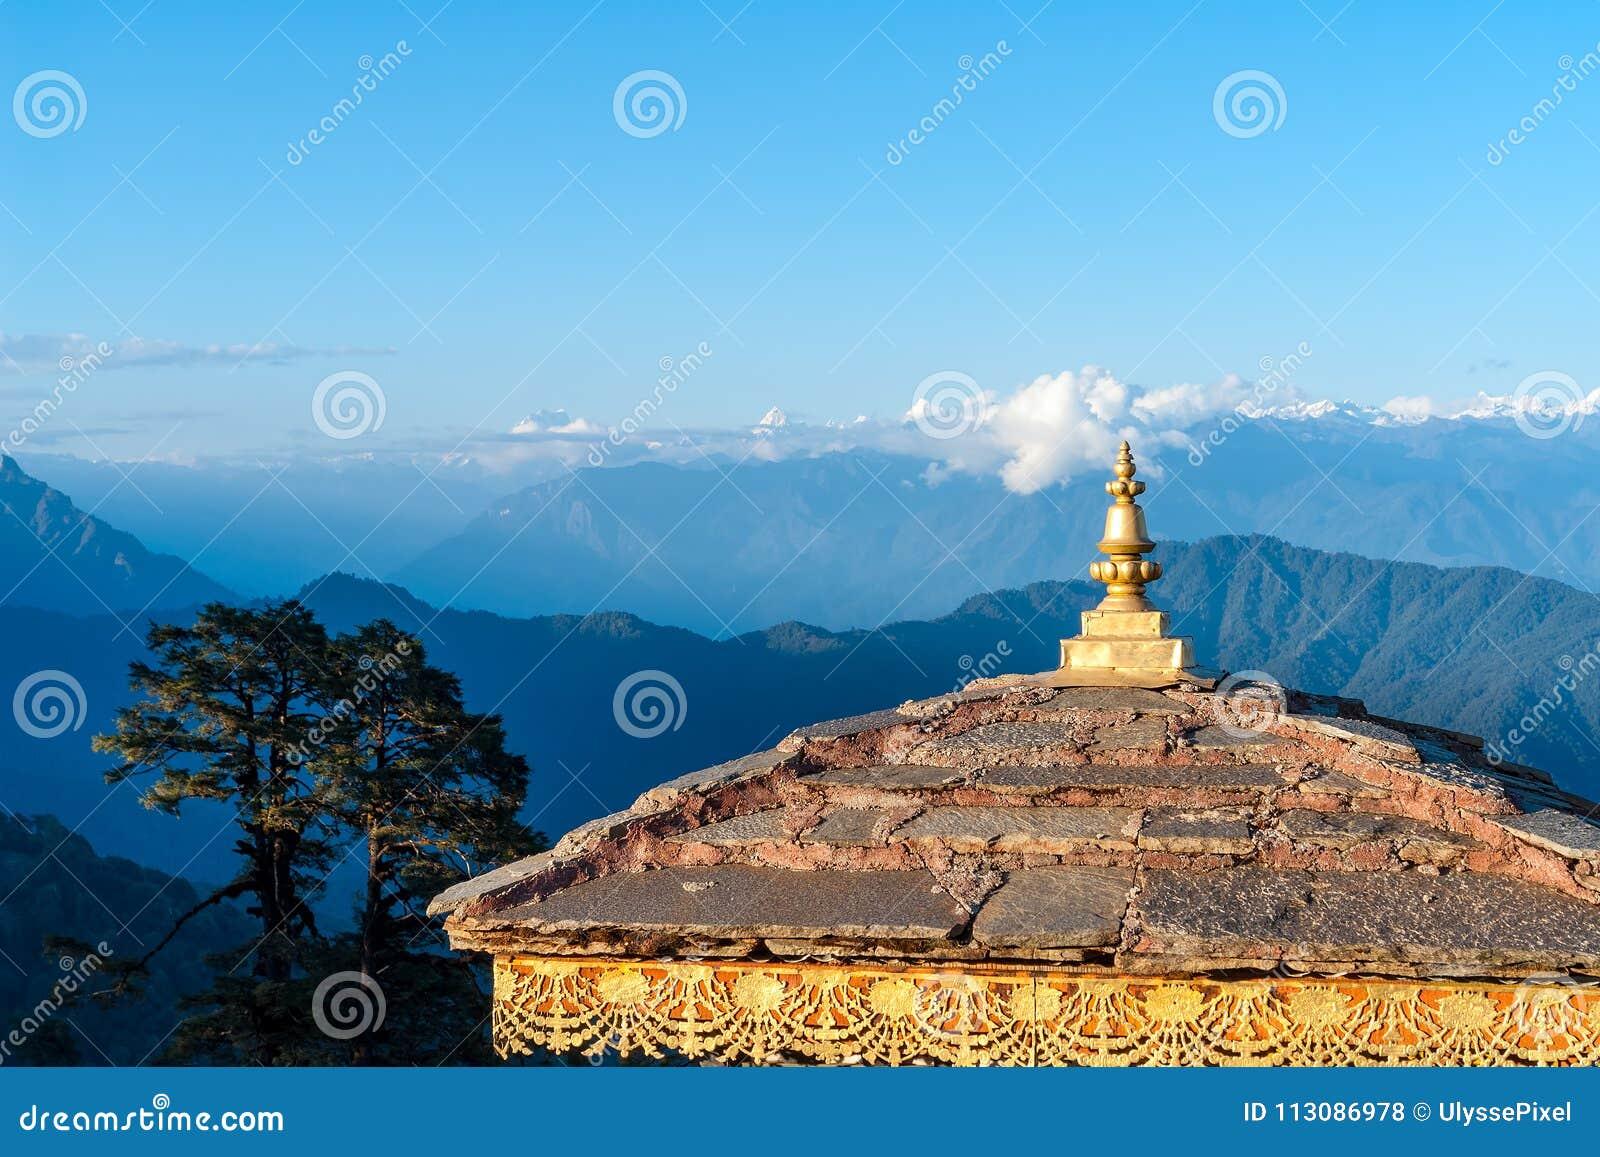 Zonsondergang op Dochula-Pas met Himalayagebergte op achtergrond - Bhutan